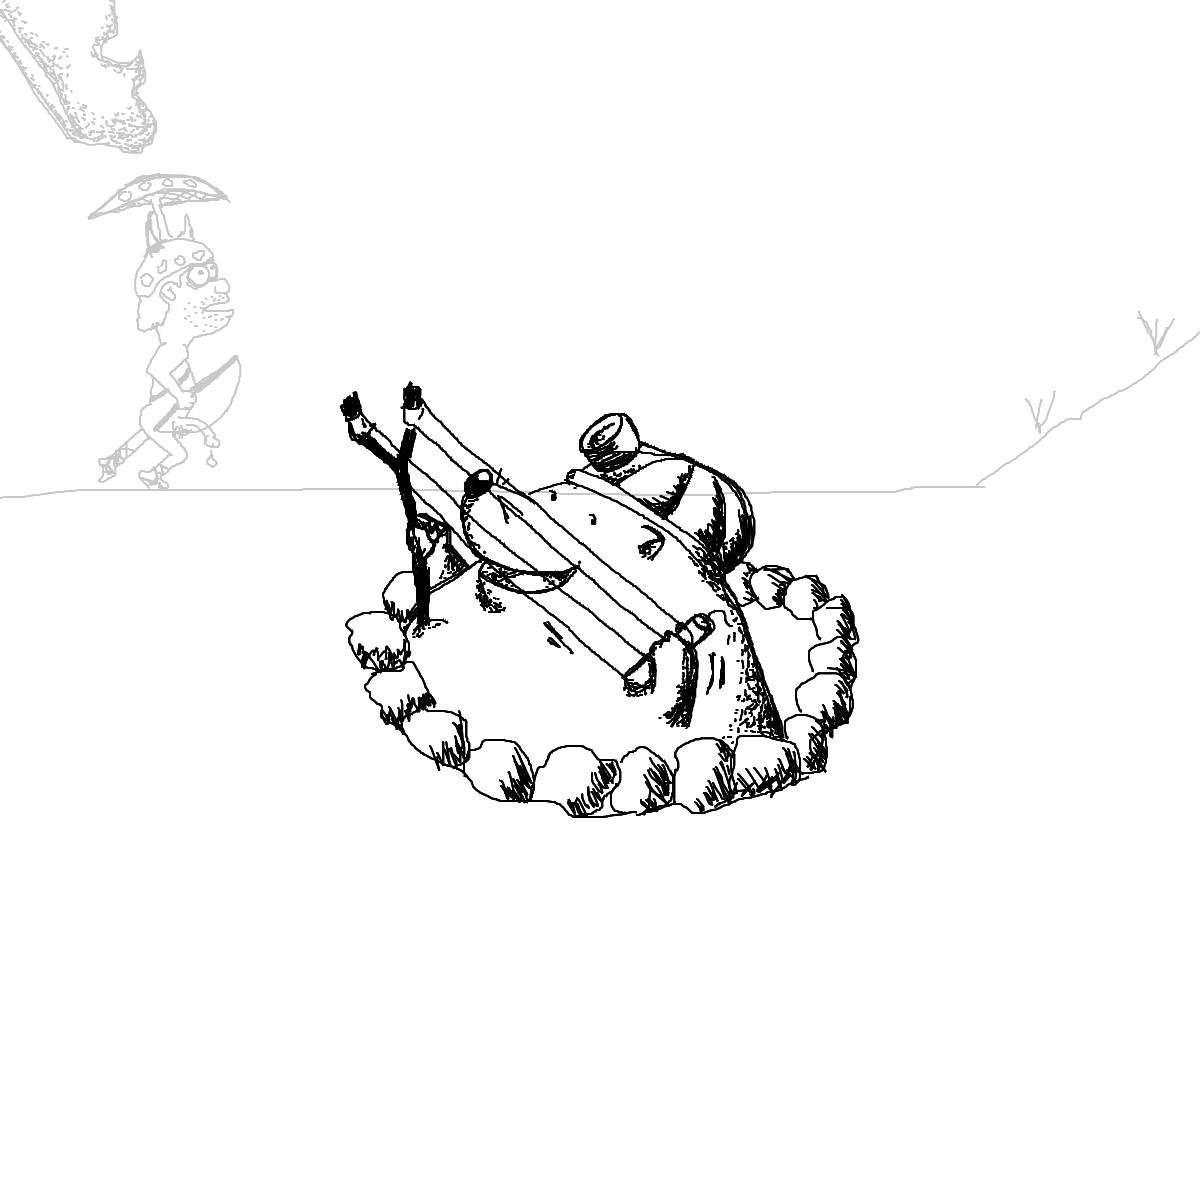 BAAAM drawing#2977 lat:43.3356437683105500lng: -1.9728322029113770